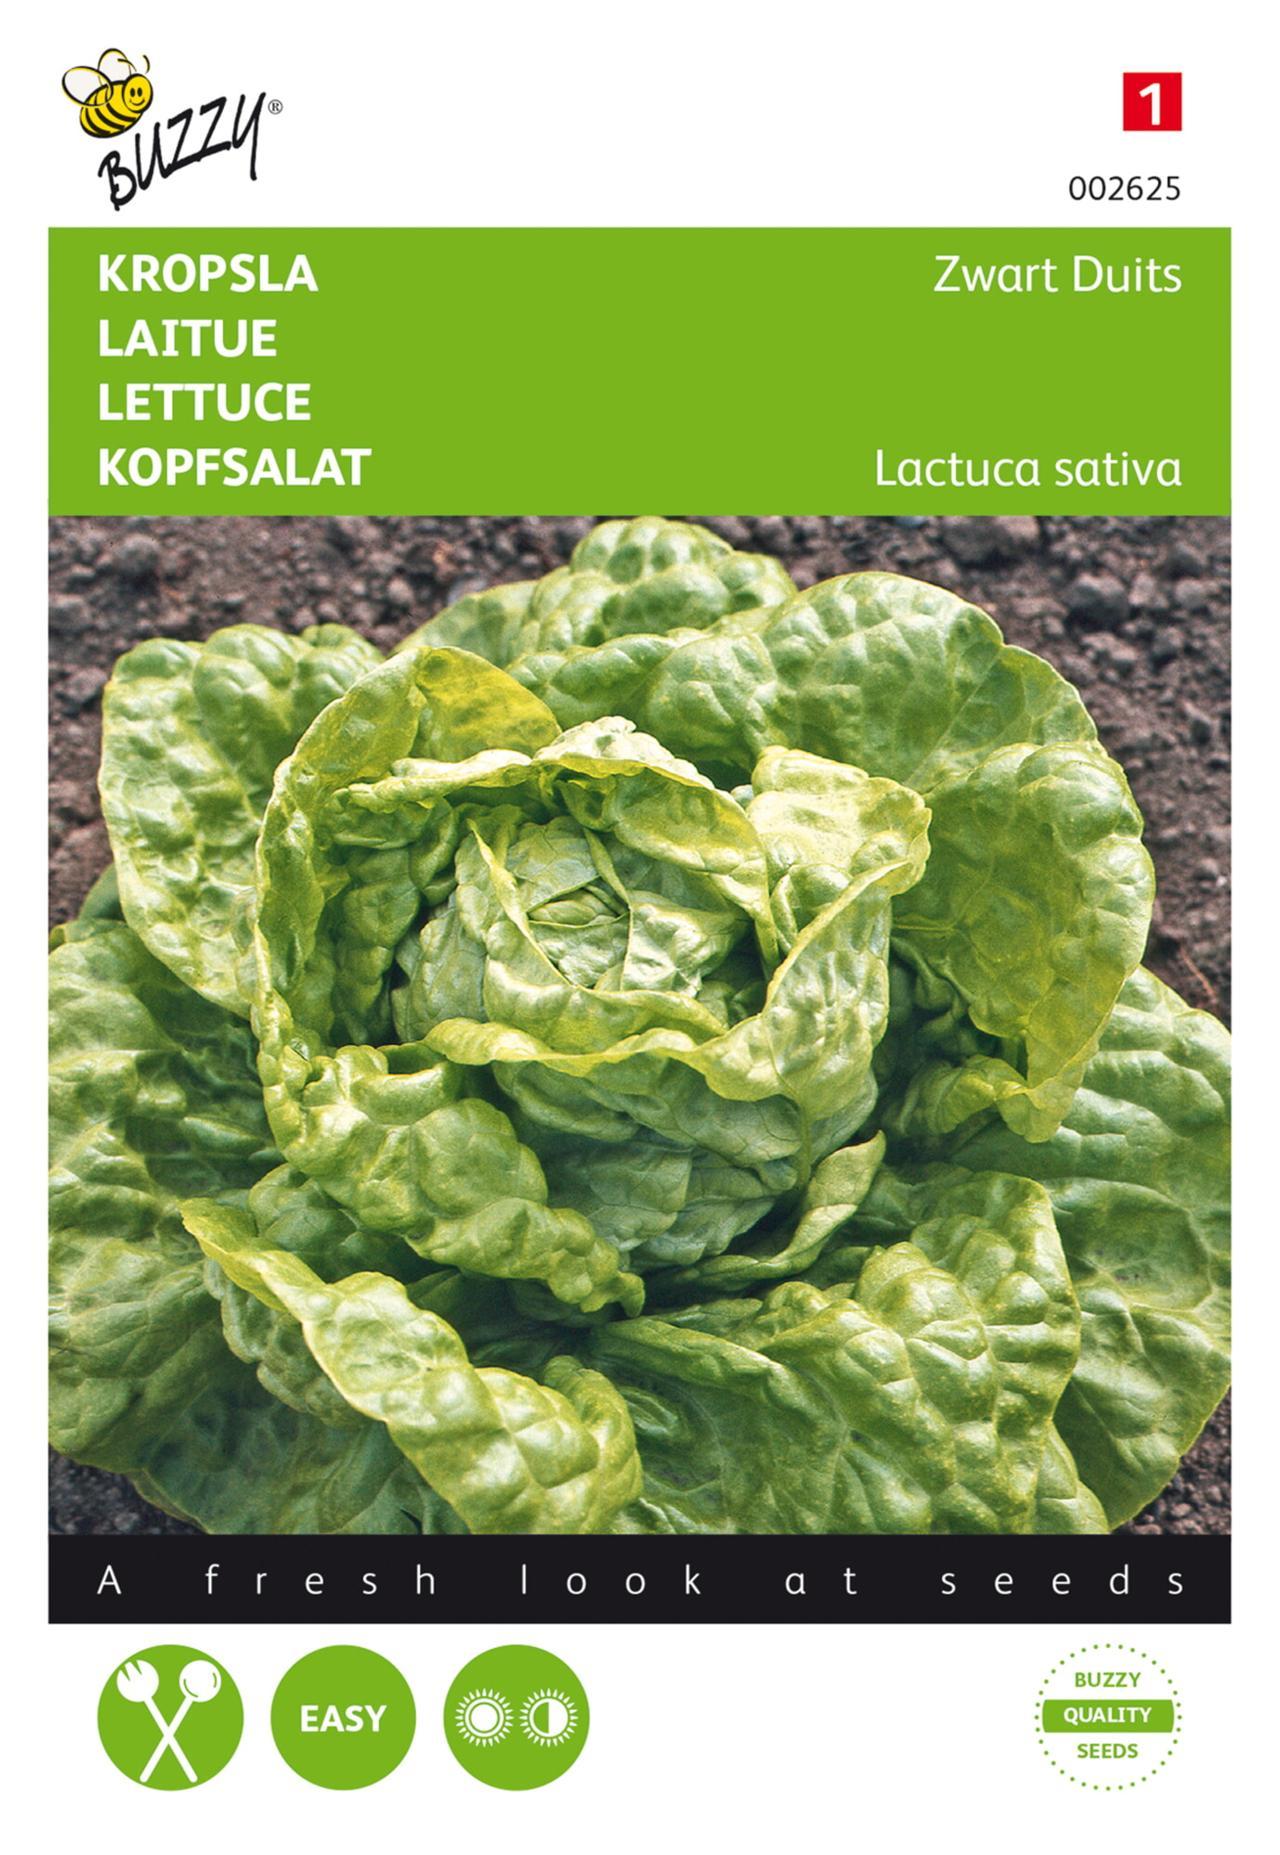 Lactuca sativa 'Zwart Duits' plant